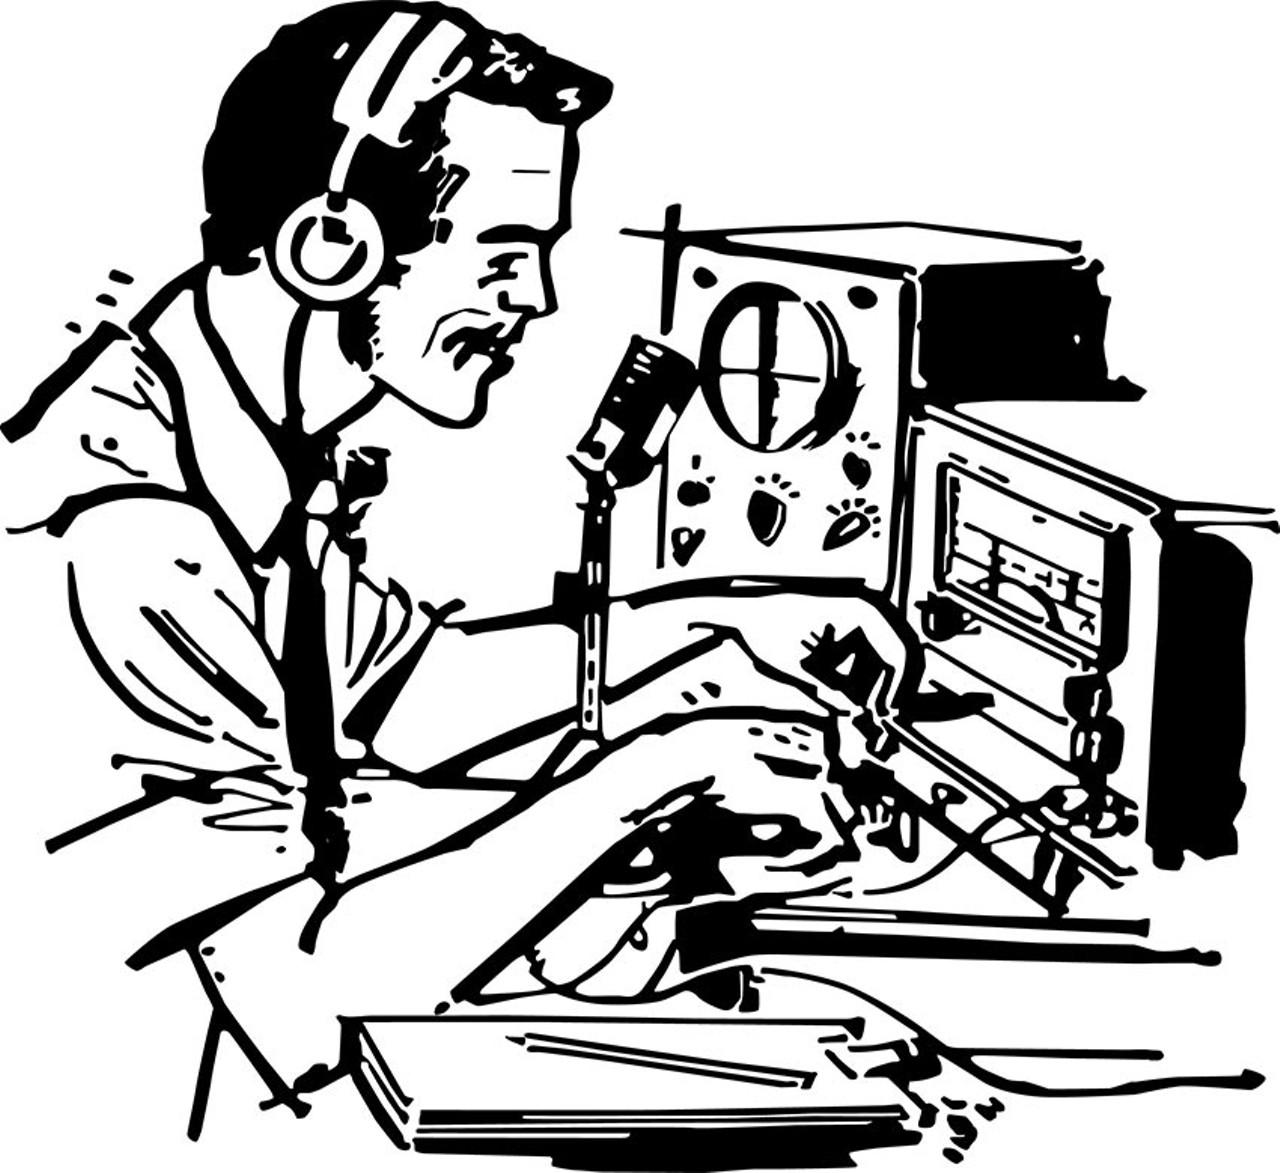 1280x1173 That's Not Real Ham Radio